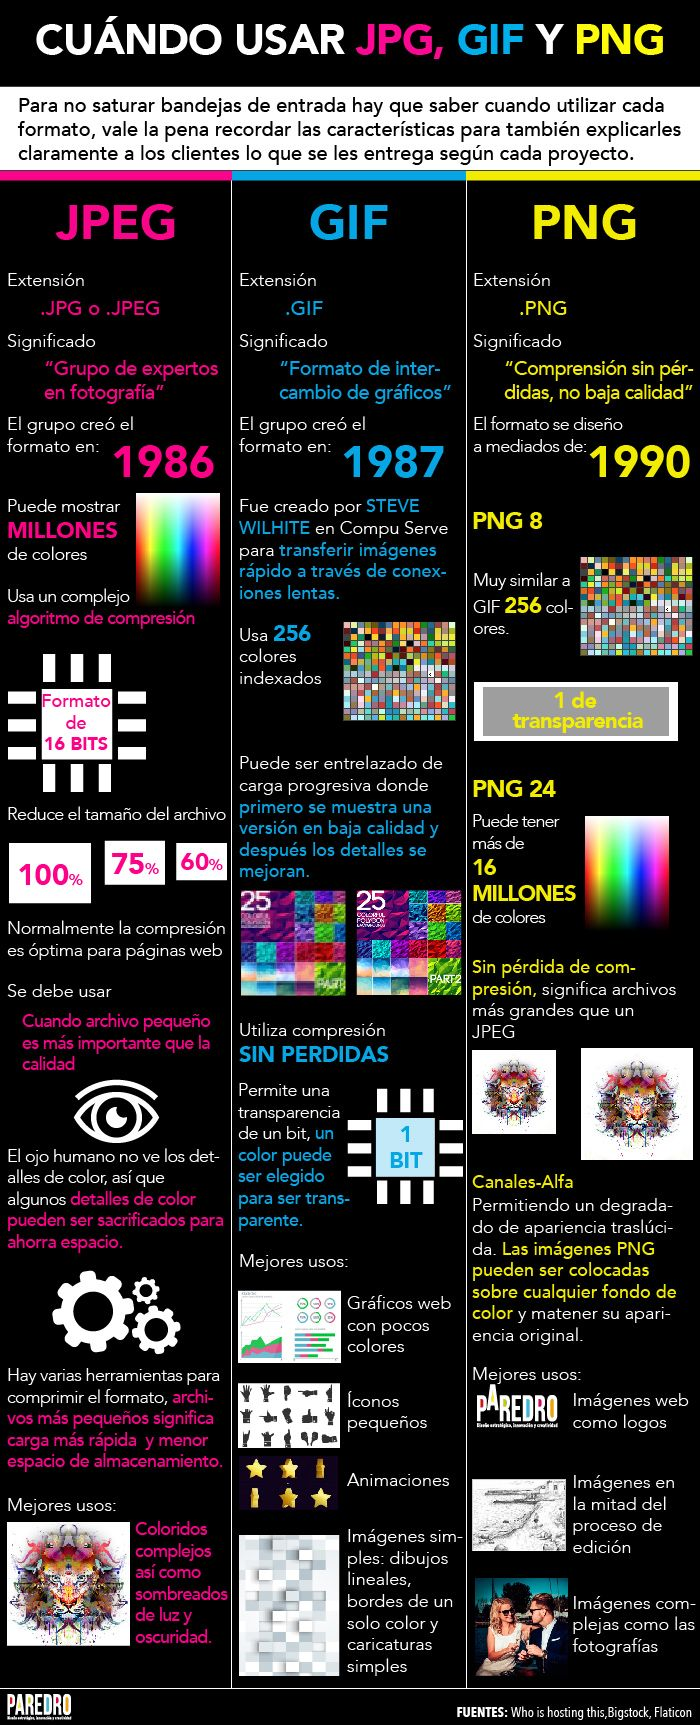 INFO_imagenes-01